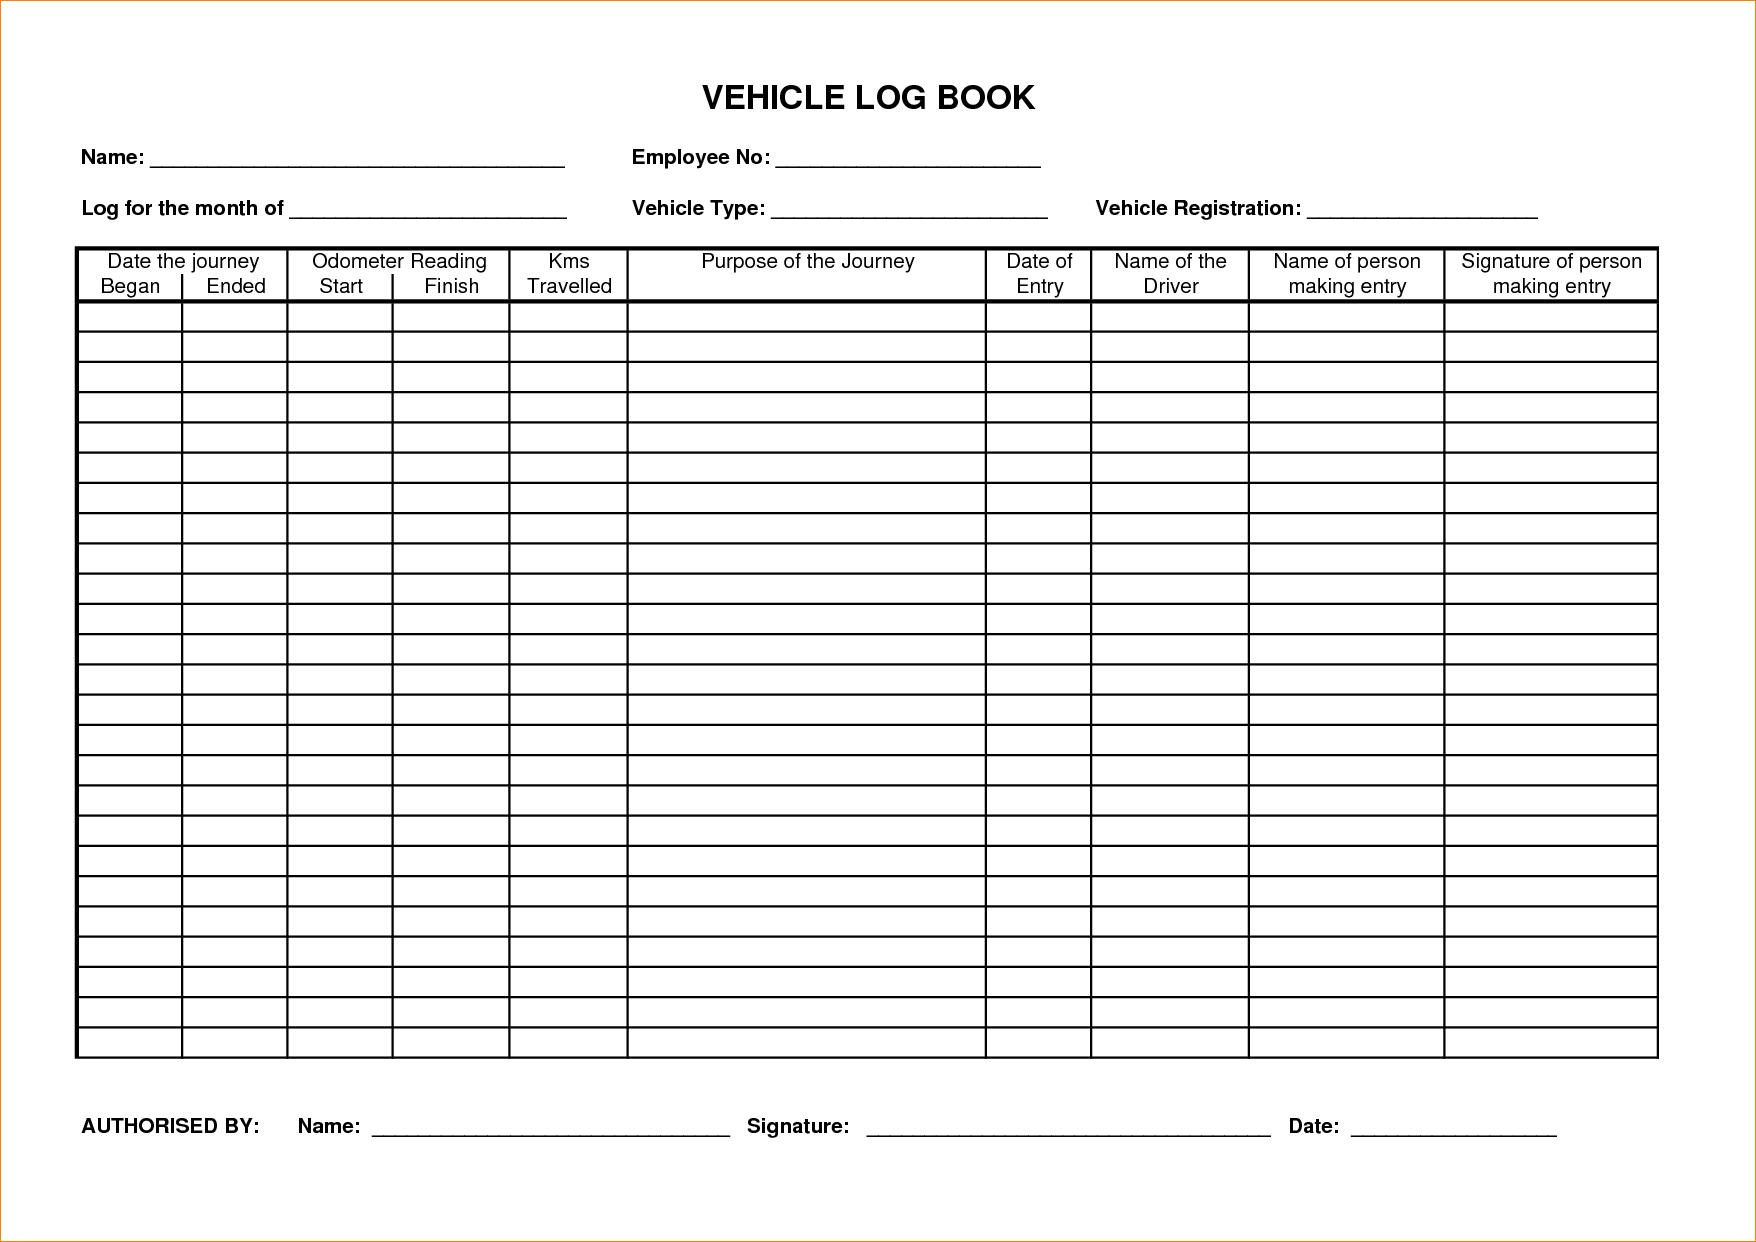 Vehicle Log Worksheet Printable Worksheets And Activities For Teachers Parents Tutors And Homeschool Families